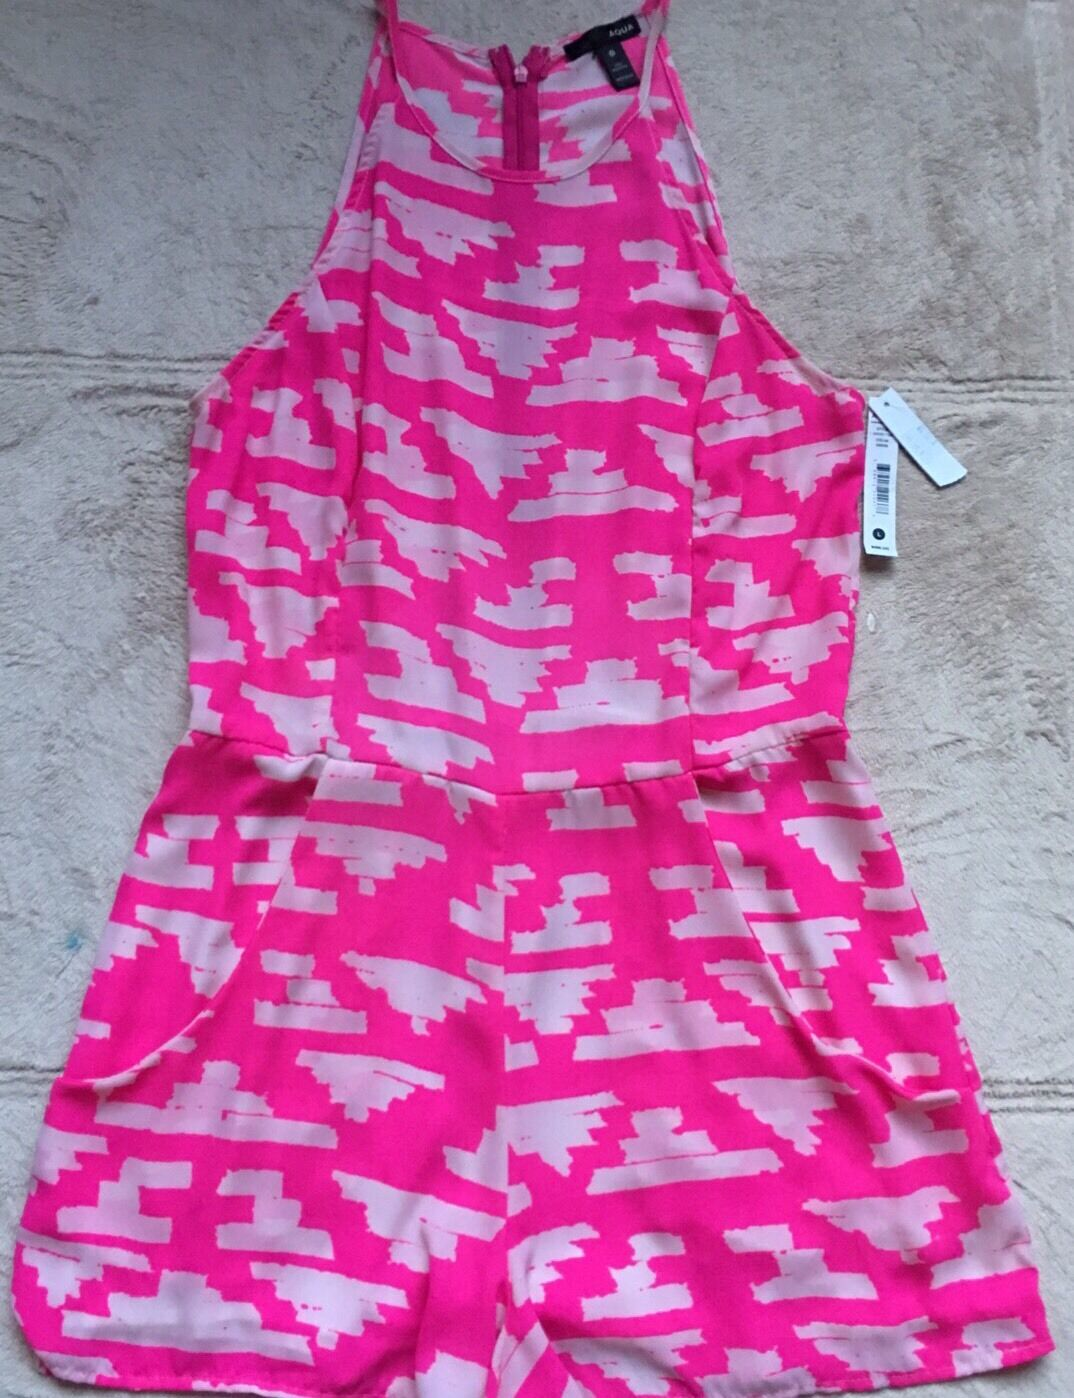 Aqua Shorts Romper Jumper 1-Piece, Large Juniors, Pink & White, Sleeveless NWT